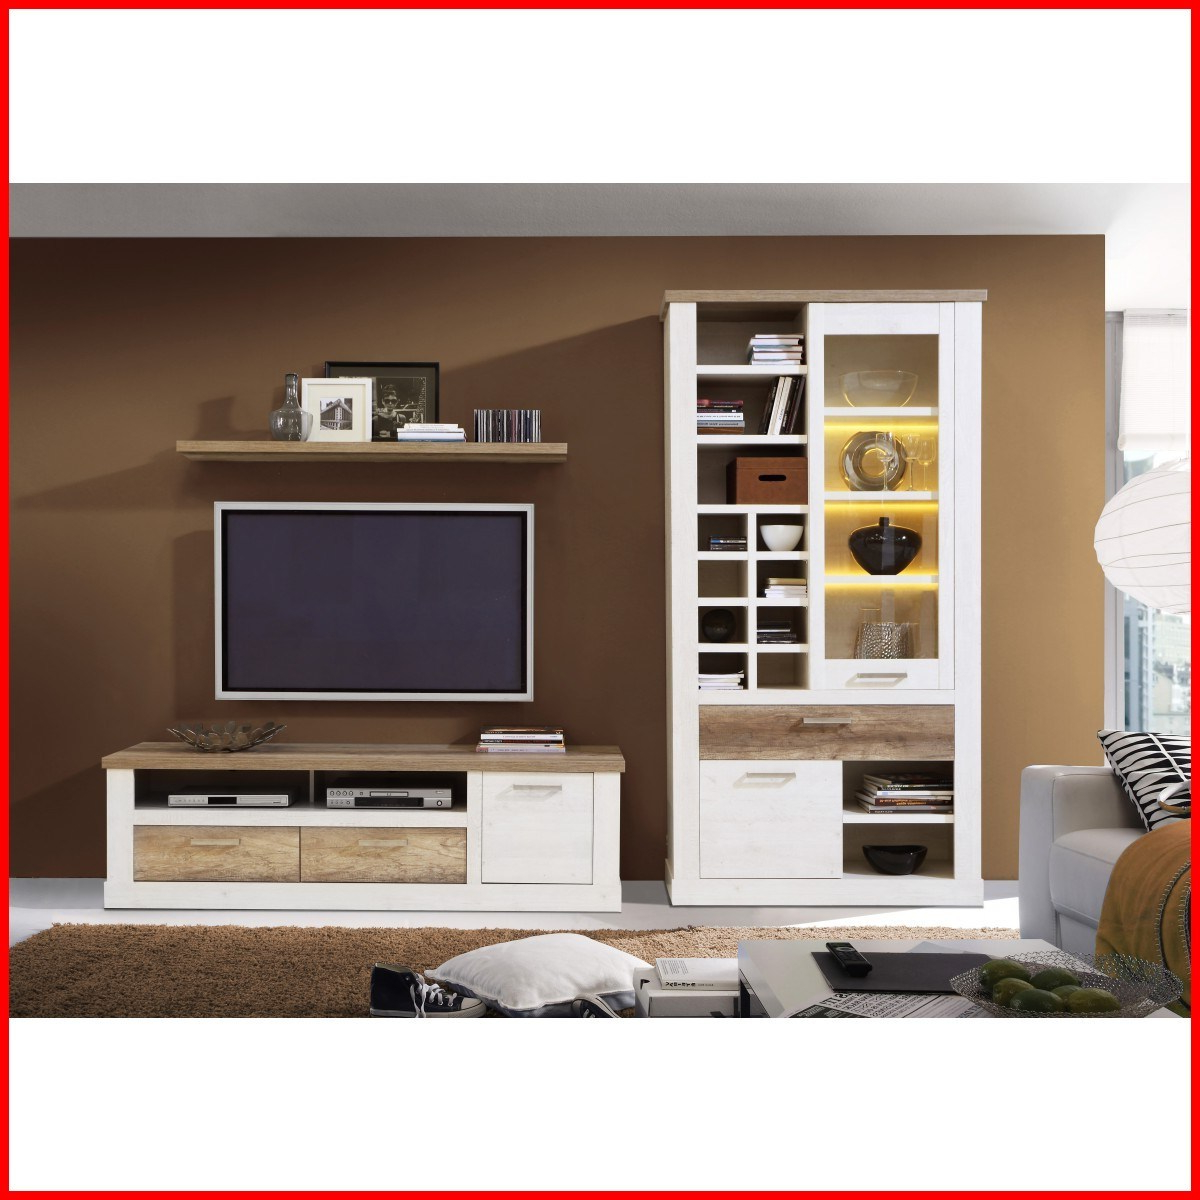 Conforama Muebles Tv S1du Cortinas Salon Conforama Conforama Mesas De Centro Salon